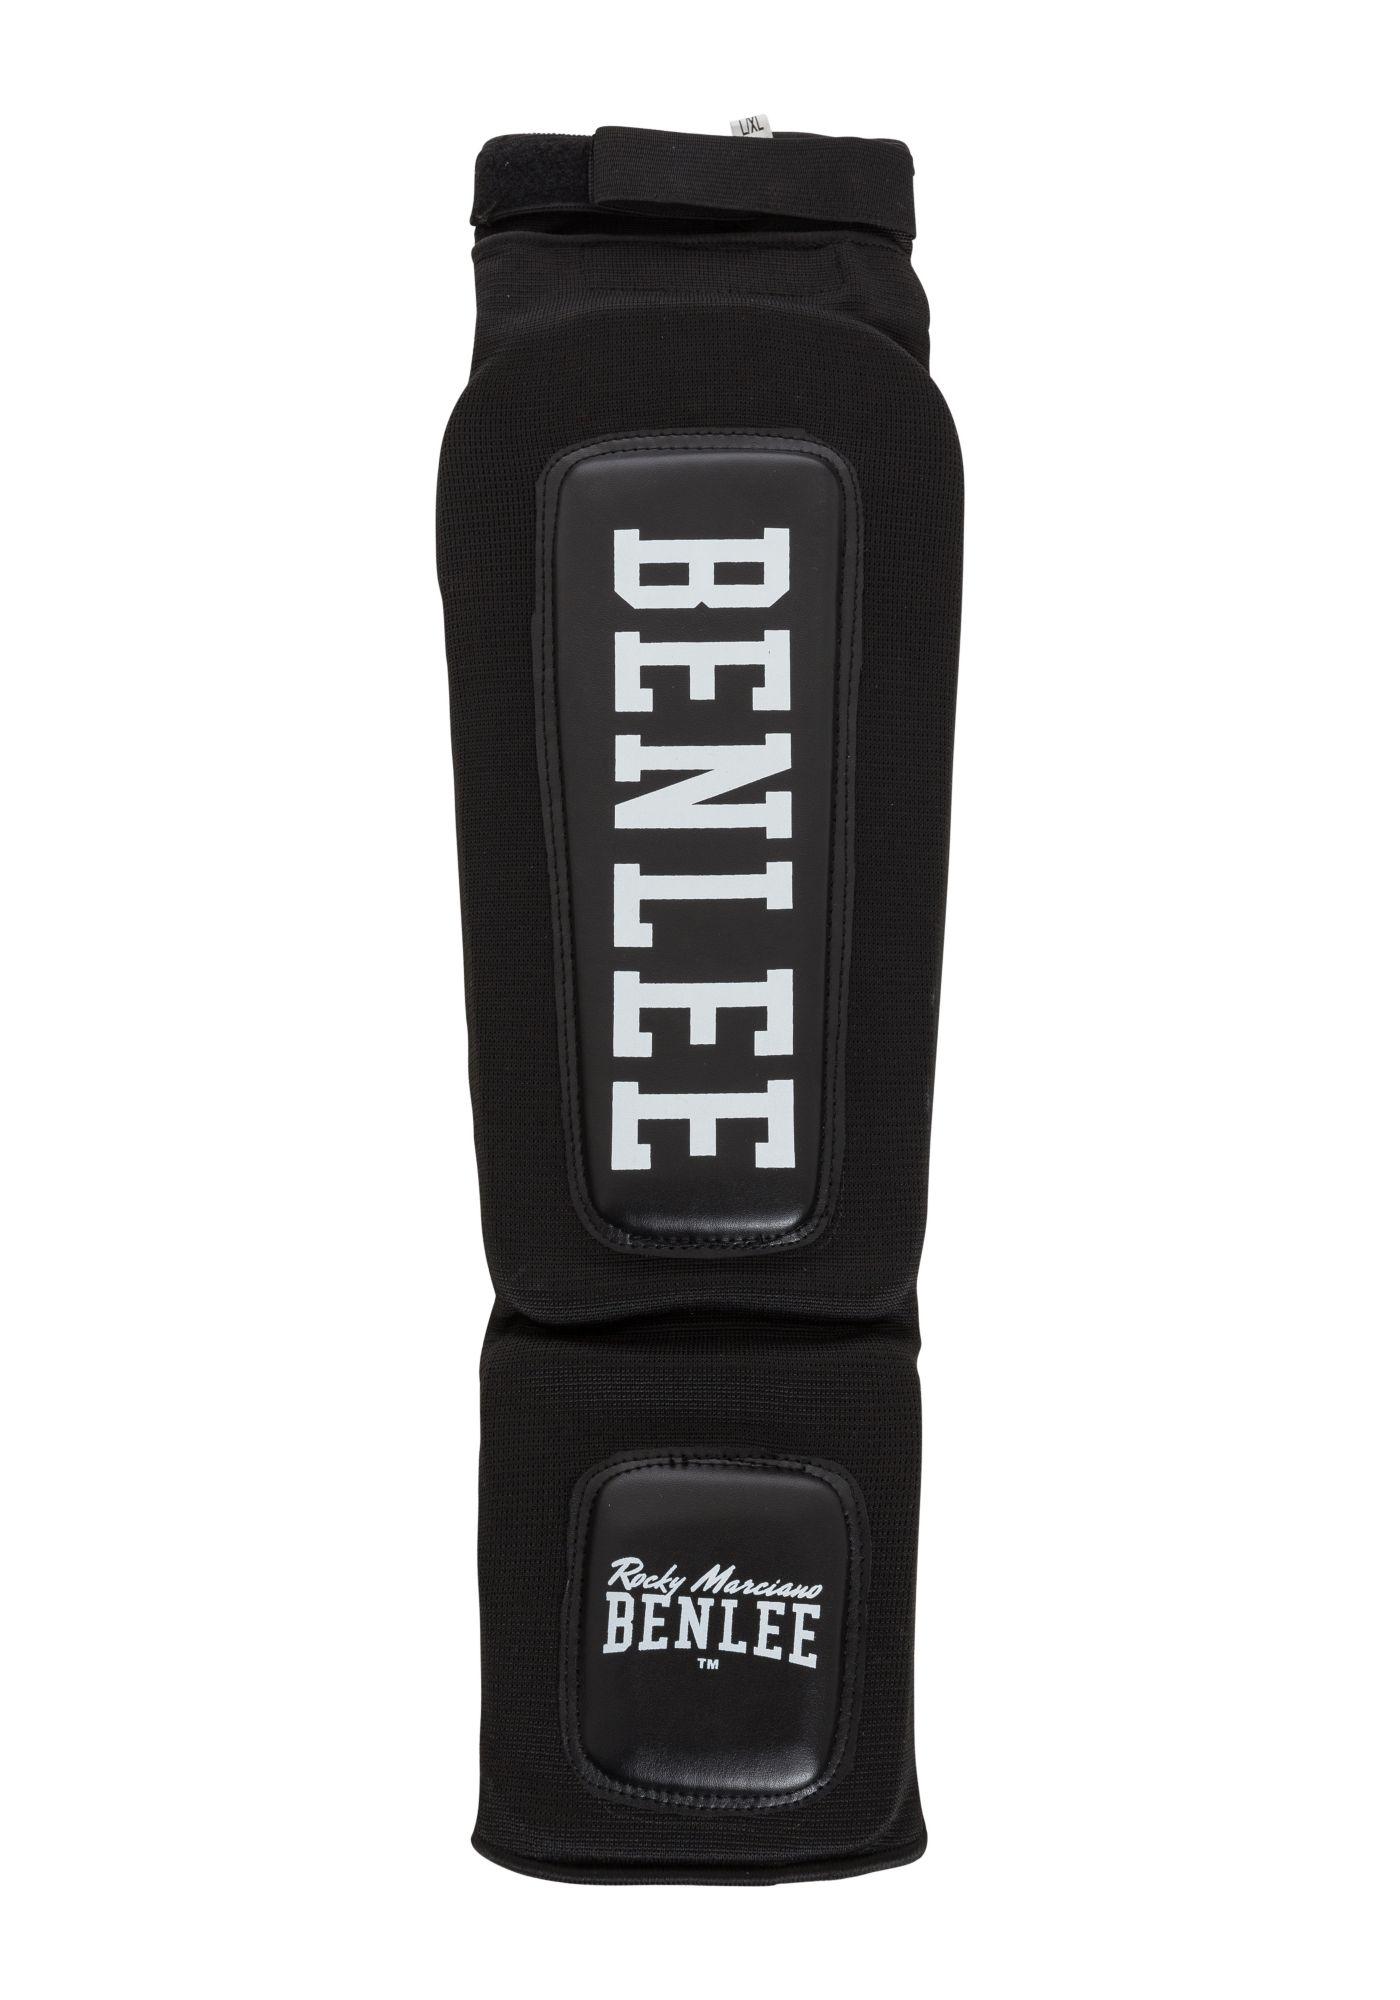 BENLEE ROCKY MARCIANO Benlee Rocky Marciano FLEXY